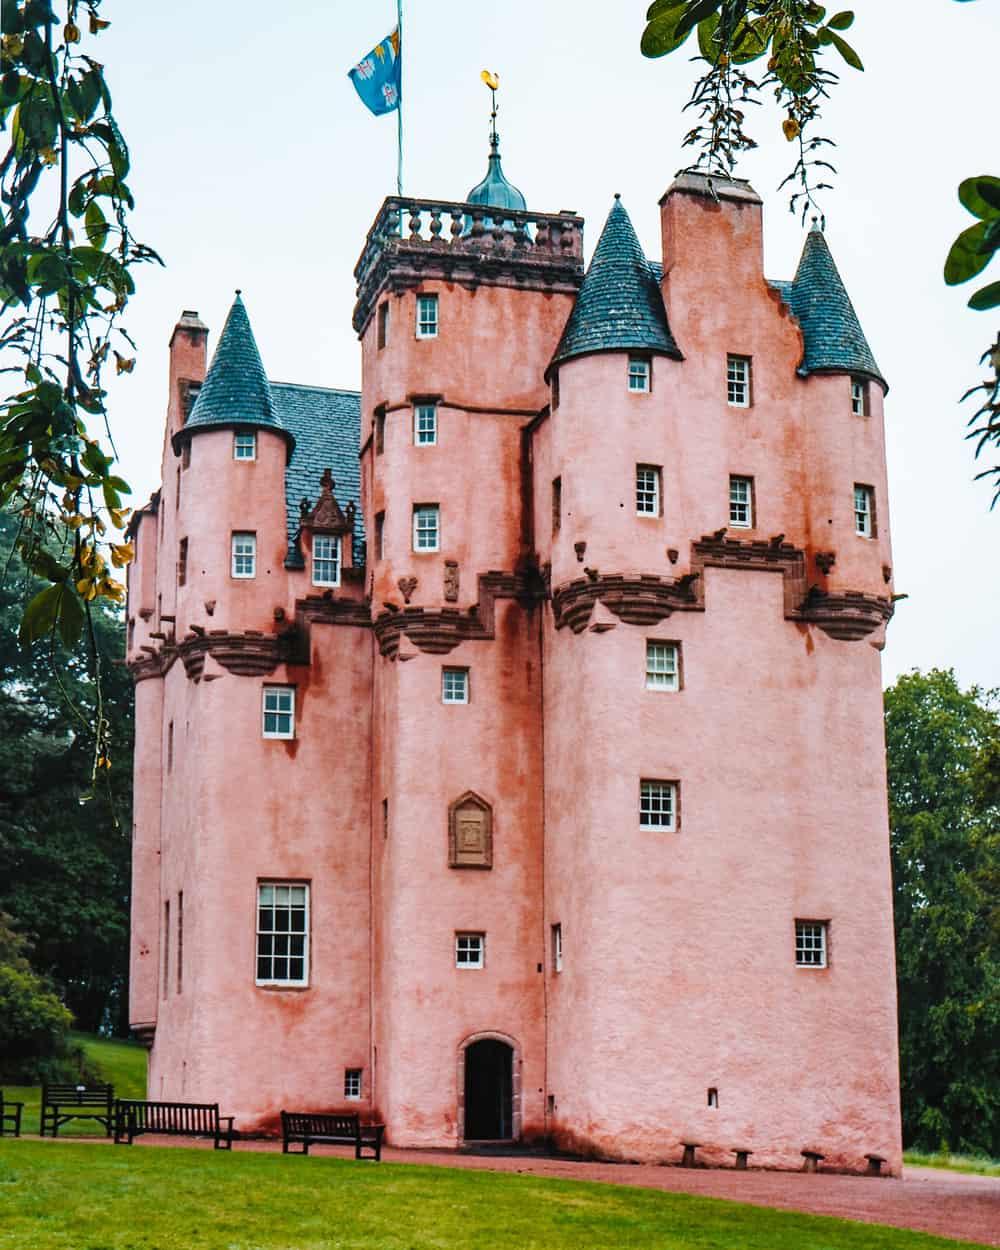 pink castle in Scotland!